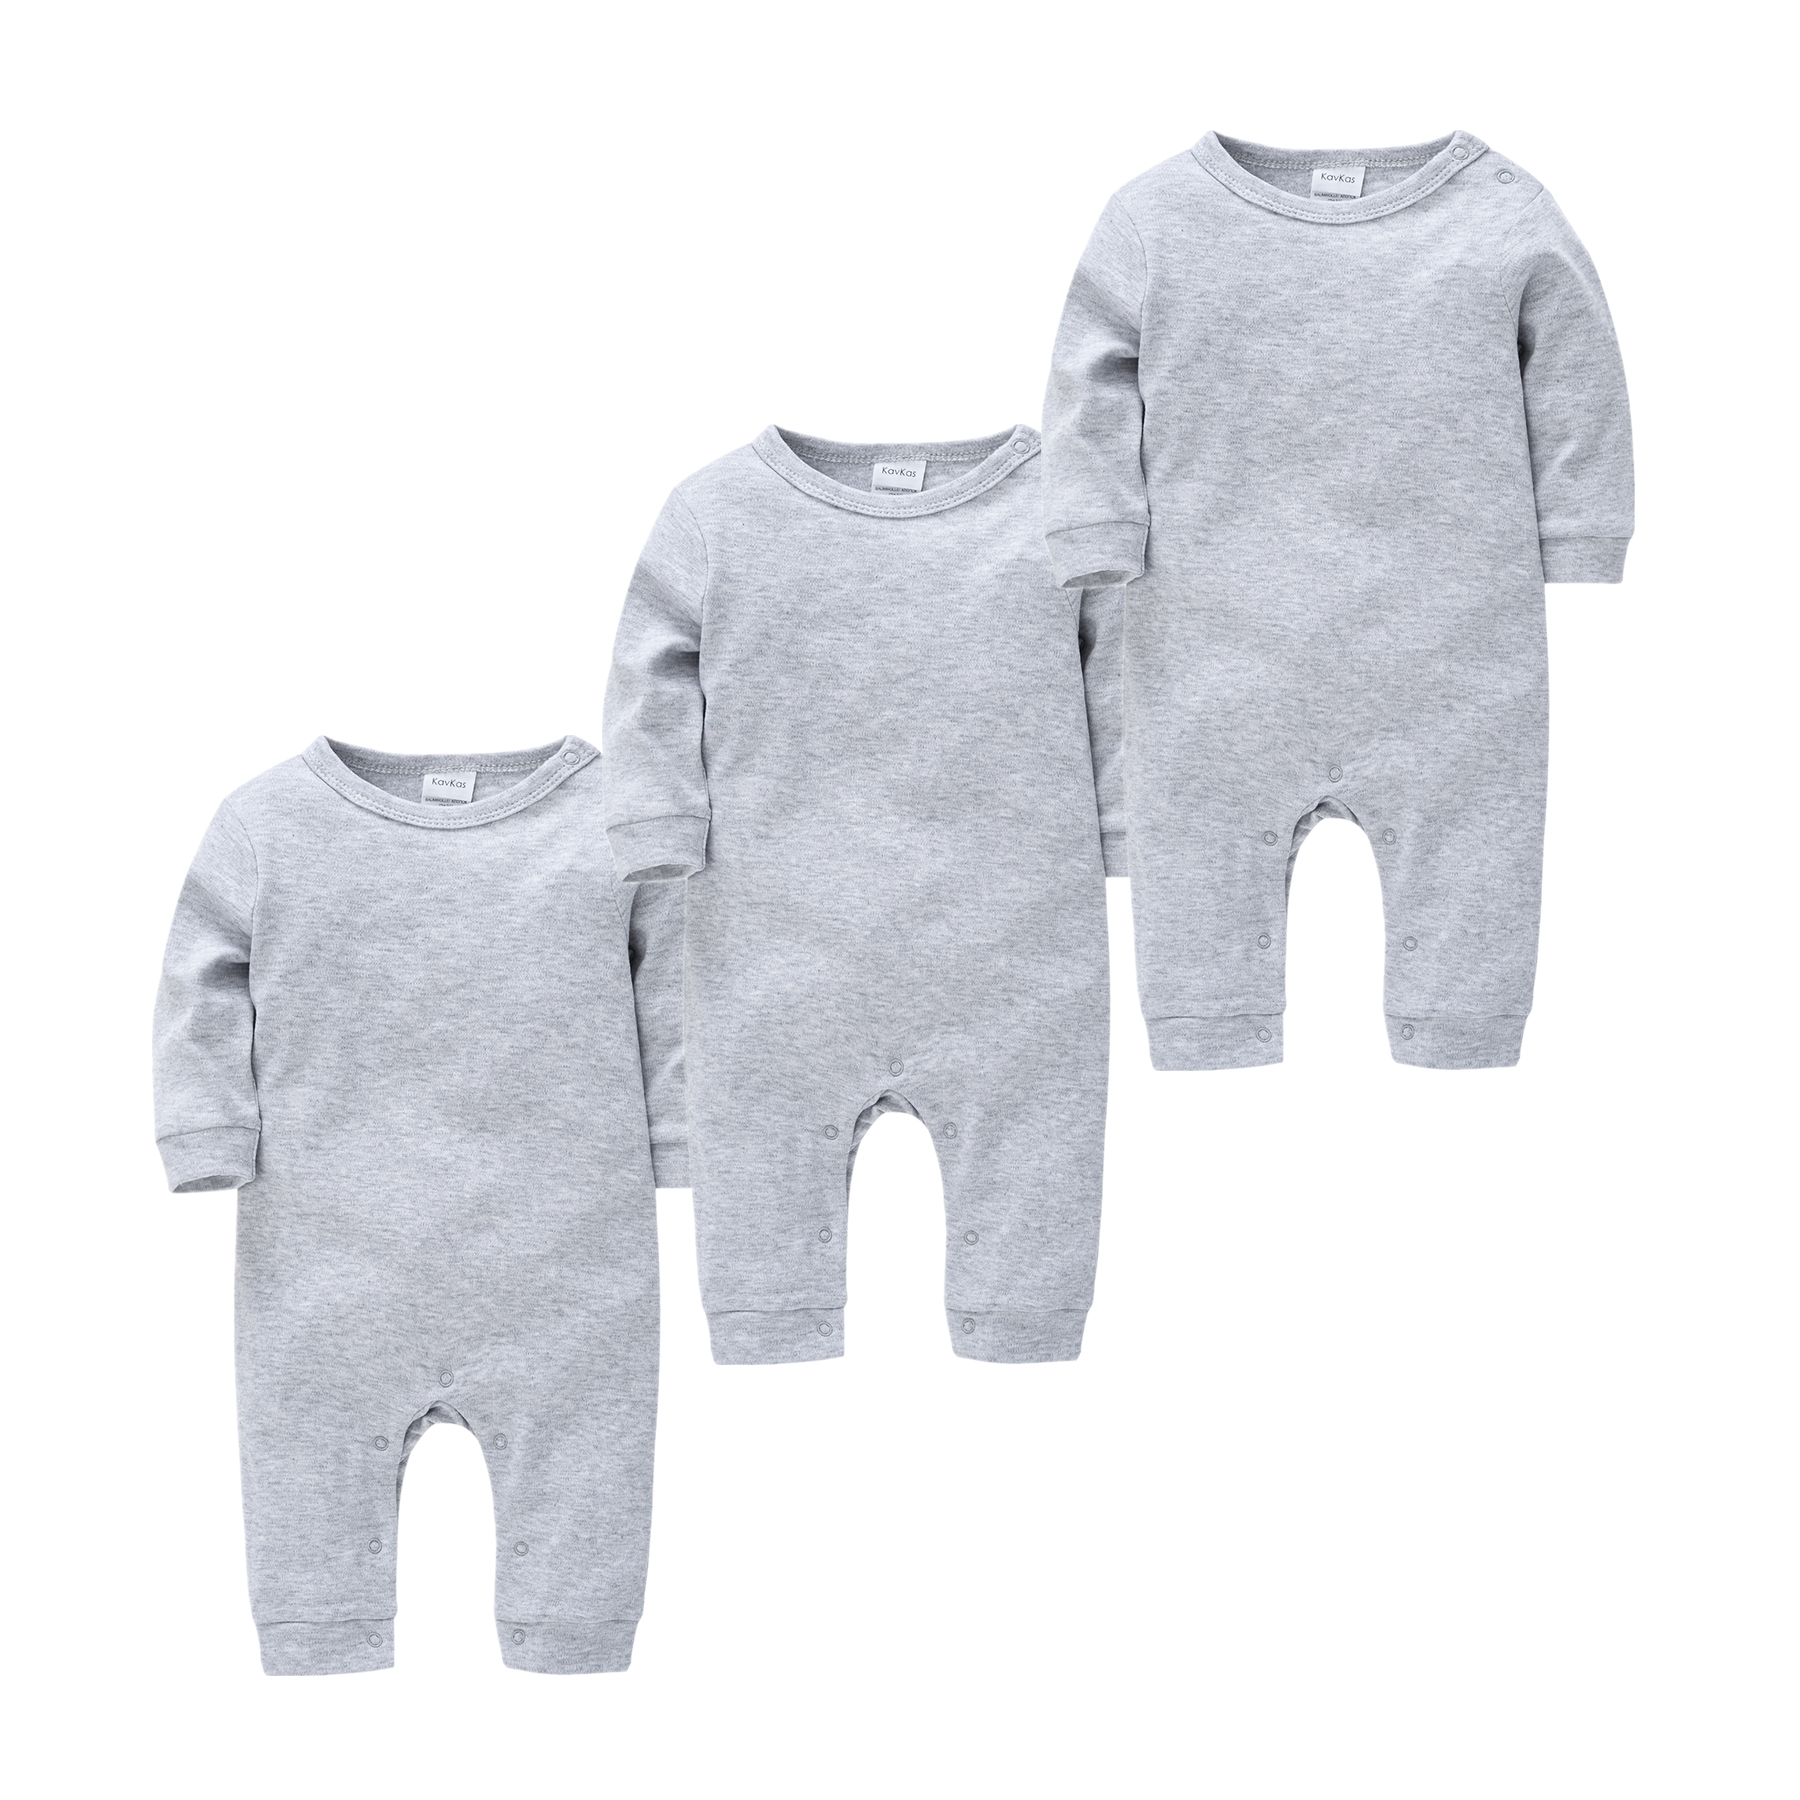 0-18M Kavkas Newborn Baby Sleepers Solid Cotton Unisex Infant Boys Rompers Onesies White Black Toddler Girls Overall Roupas Bebe